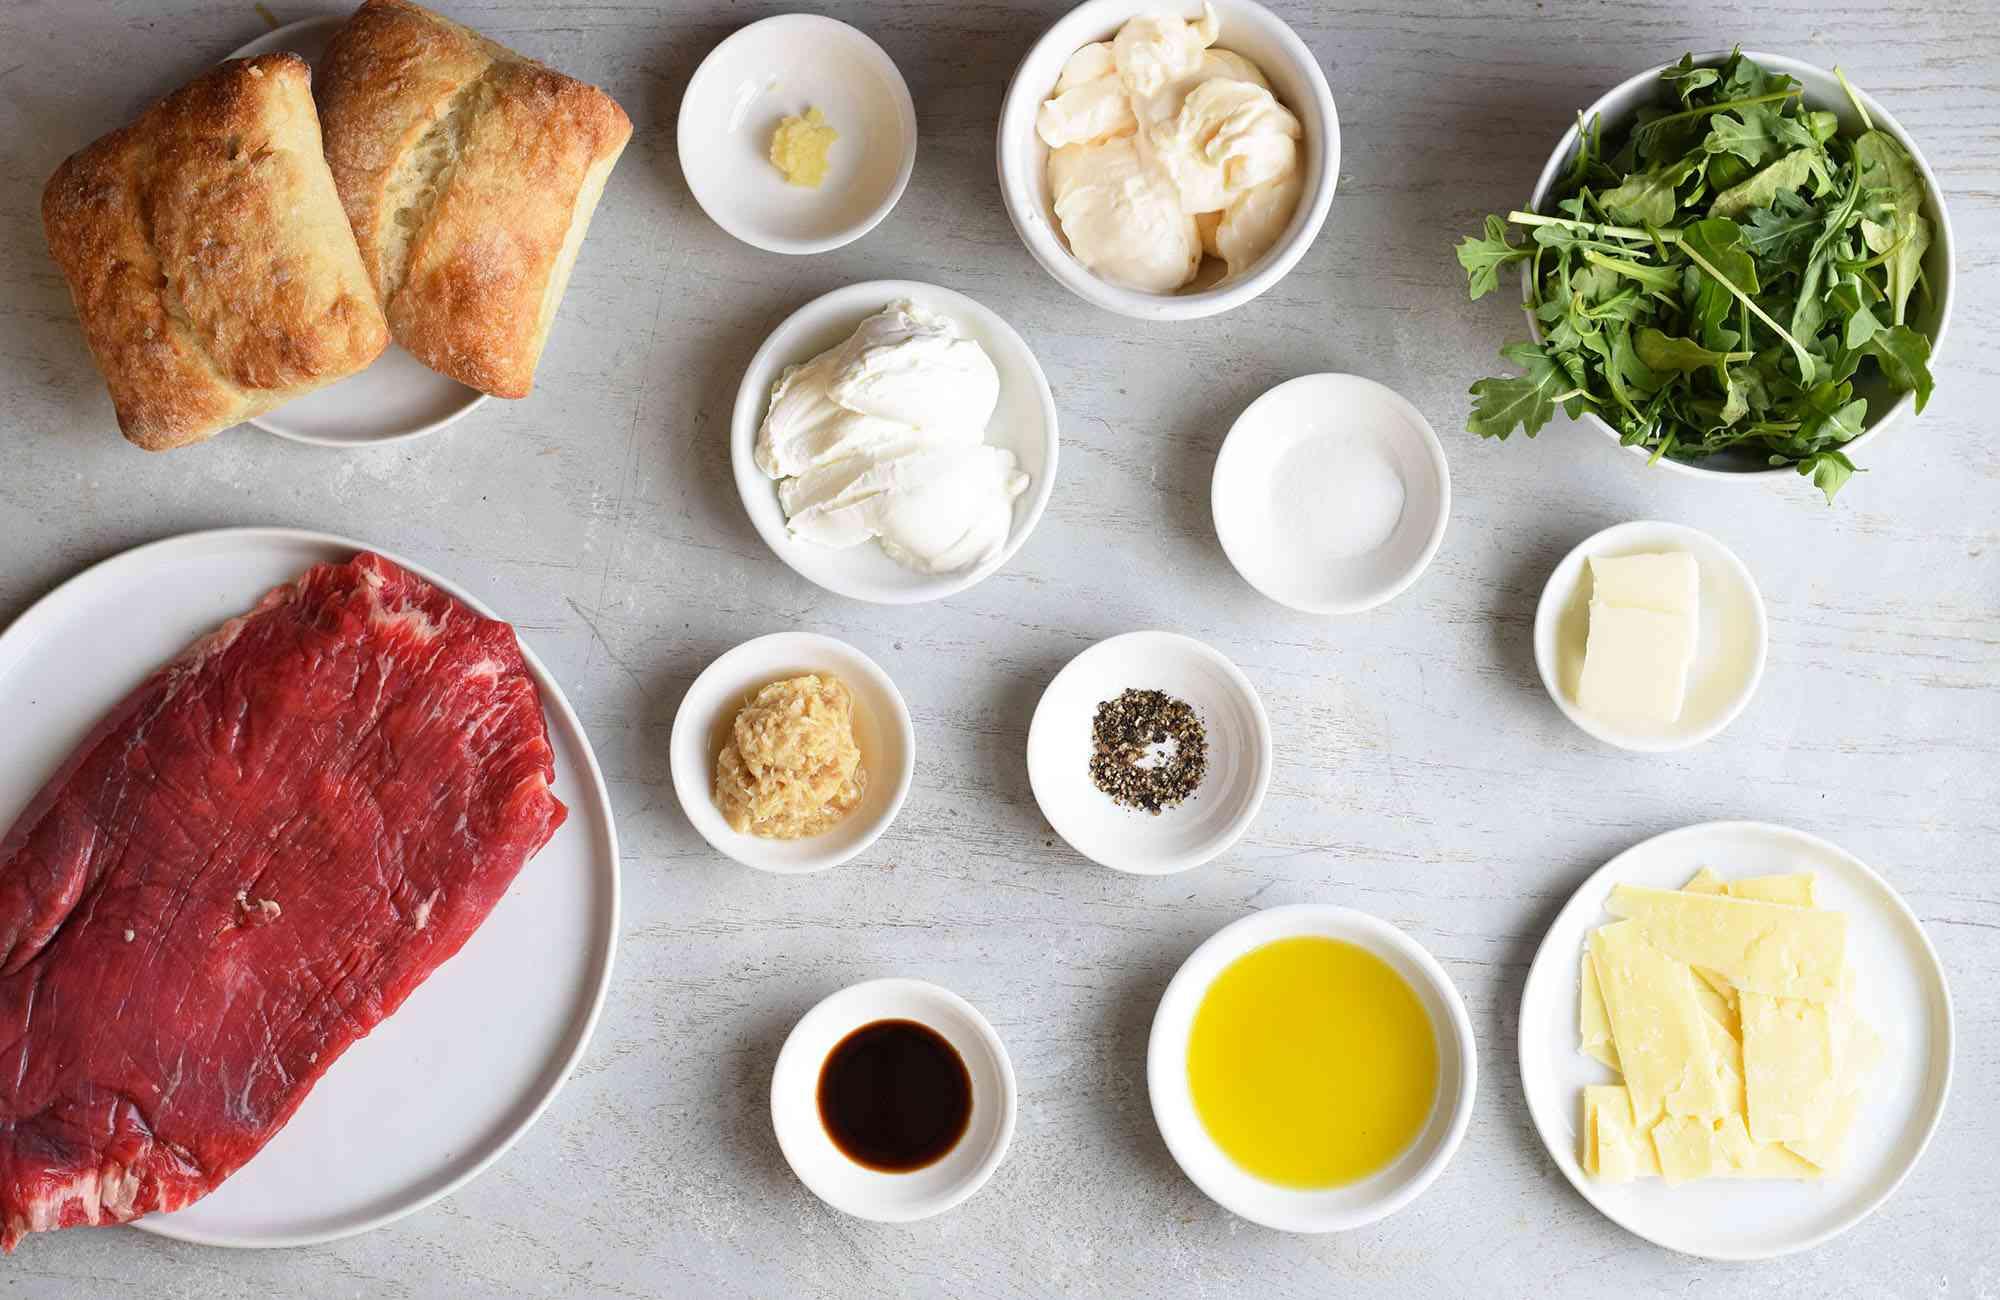 ingredients for steak sandwich